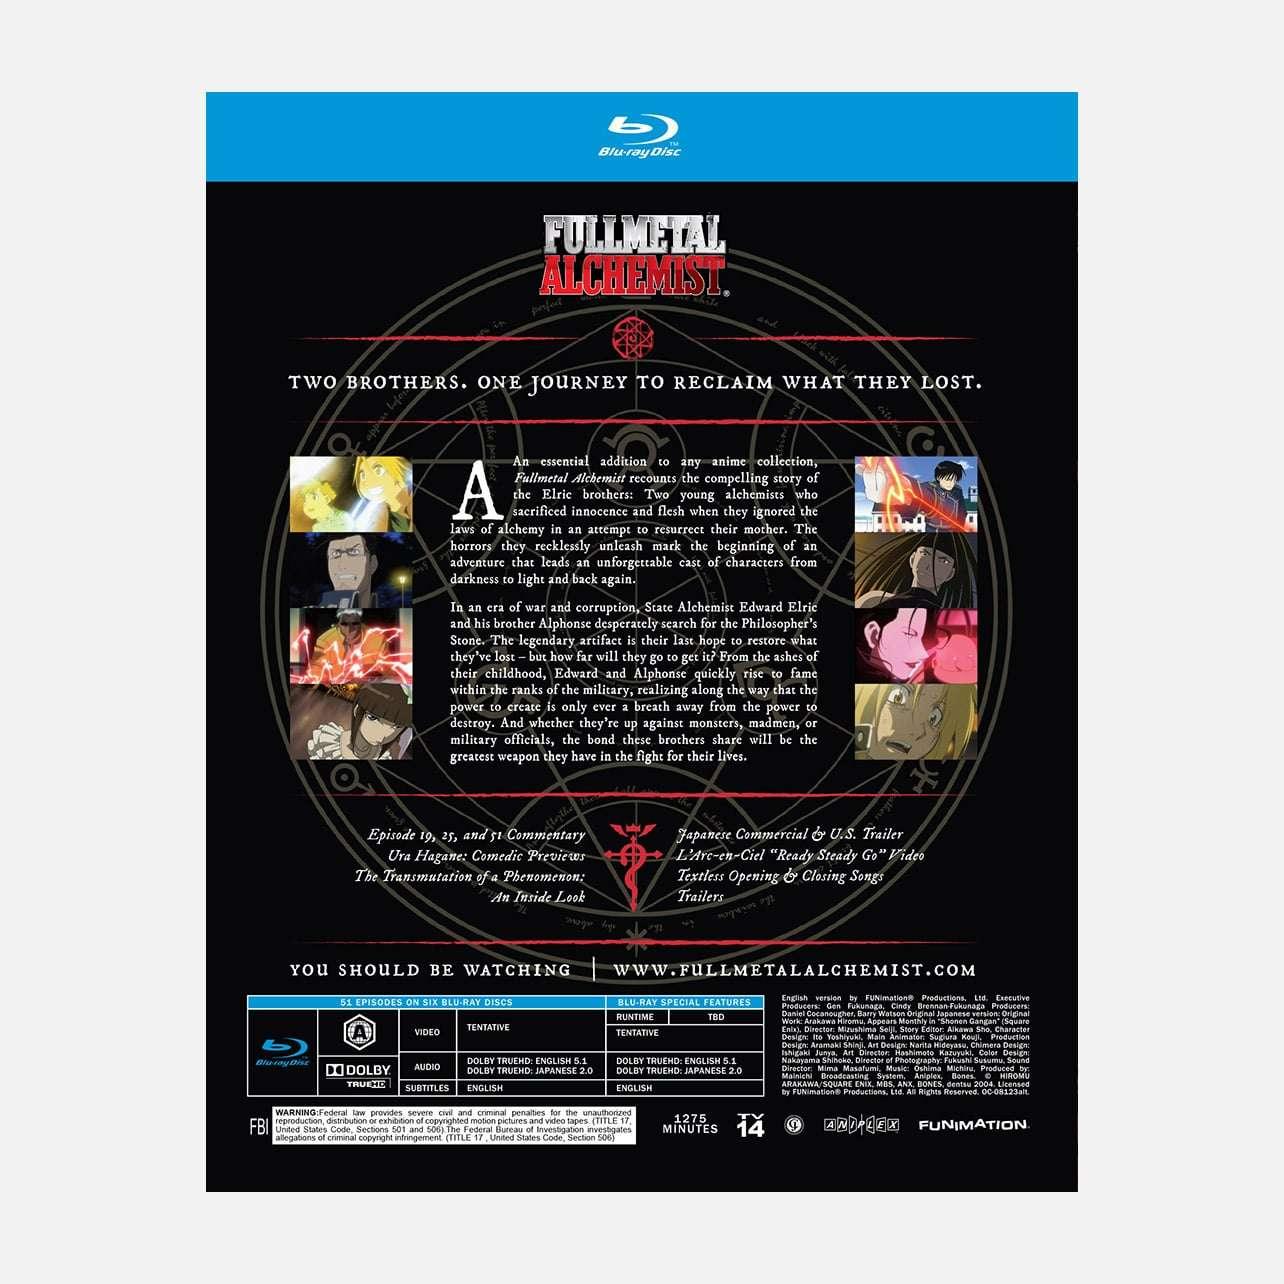 Shop Fullmetal Alchemist The Complete Series | Funimation